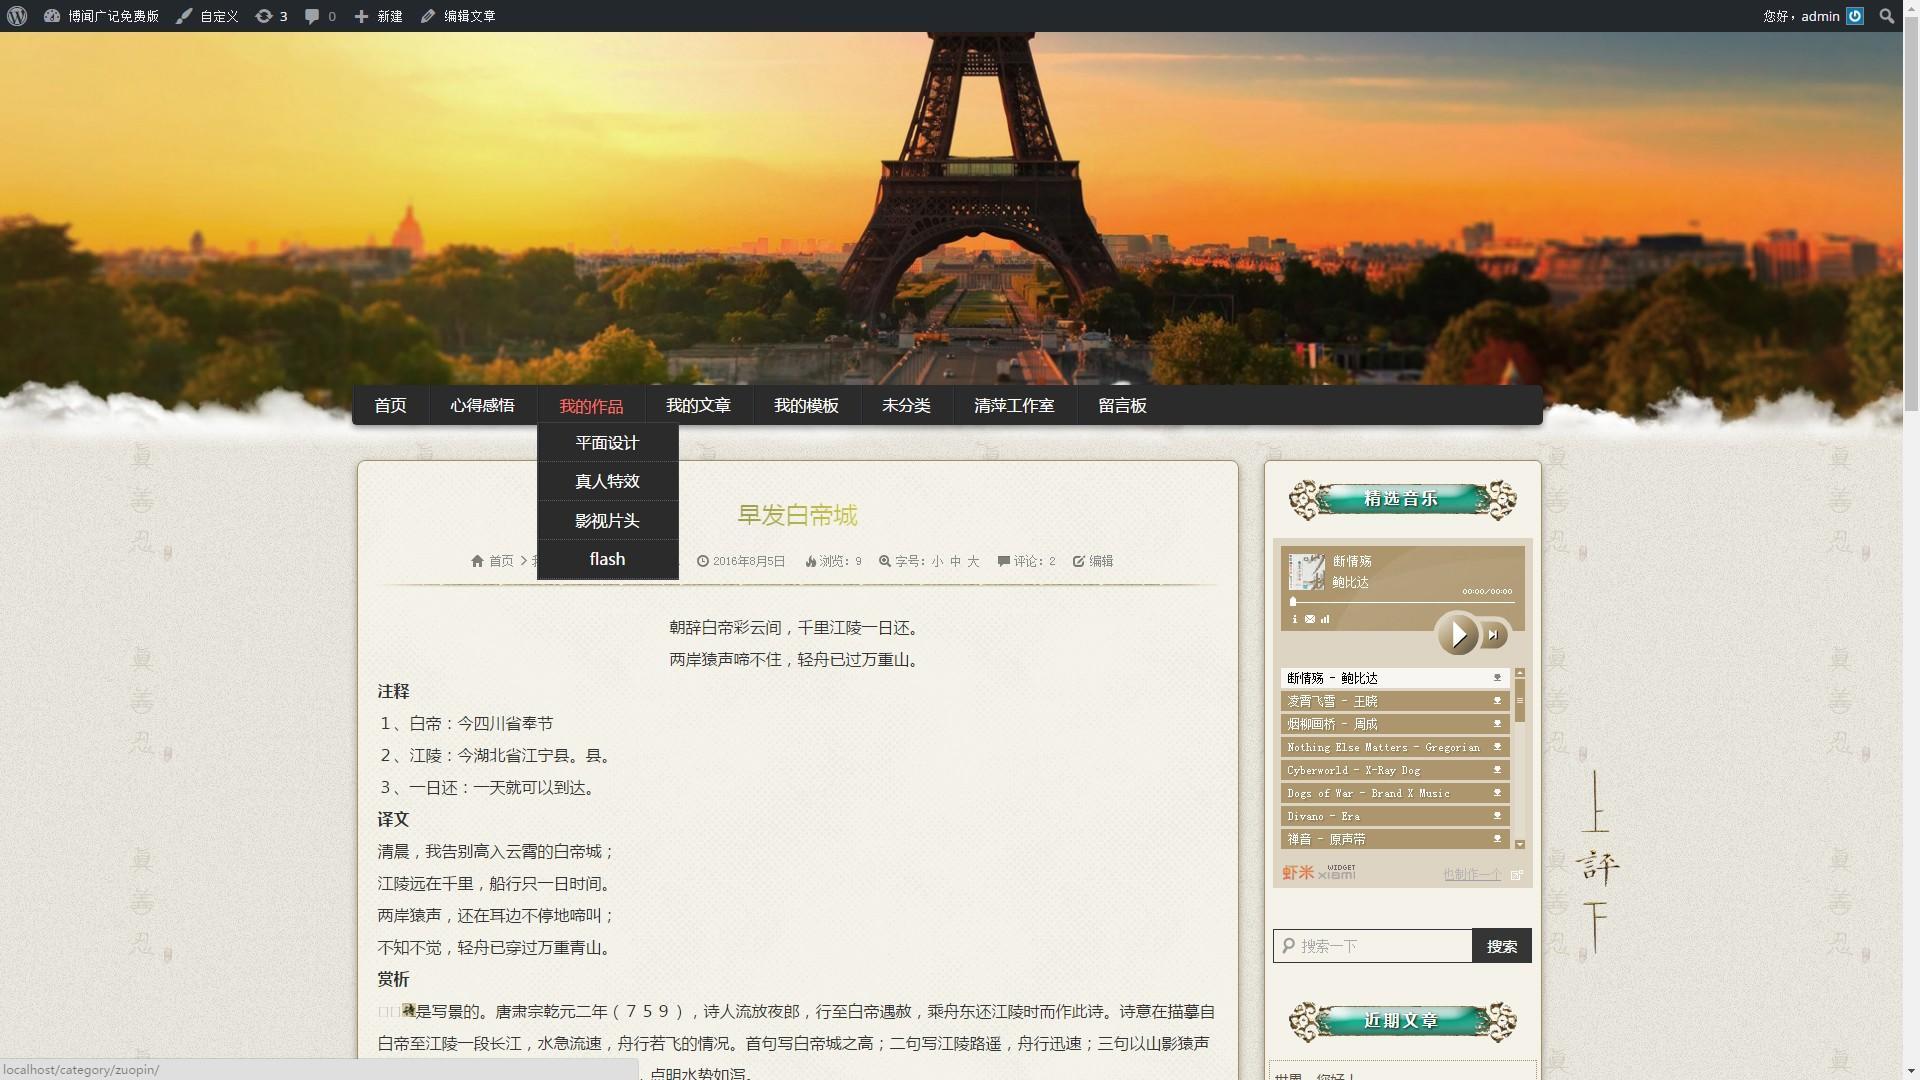 Wordpress博客主题博闻广记免费版